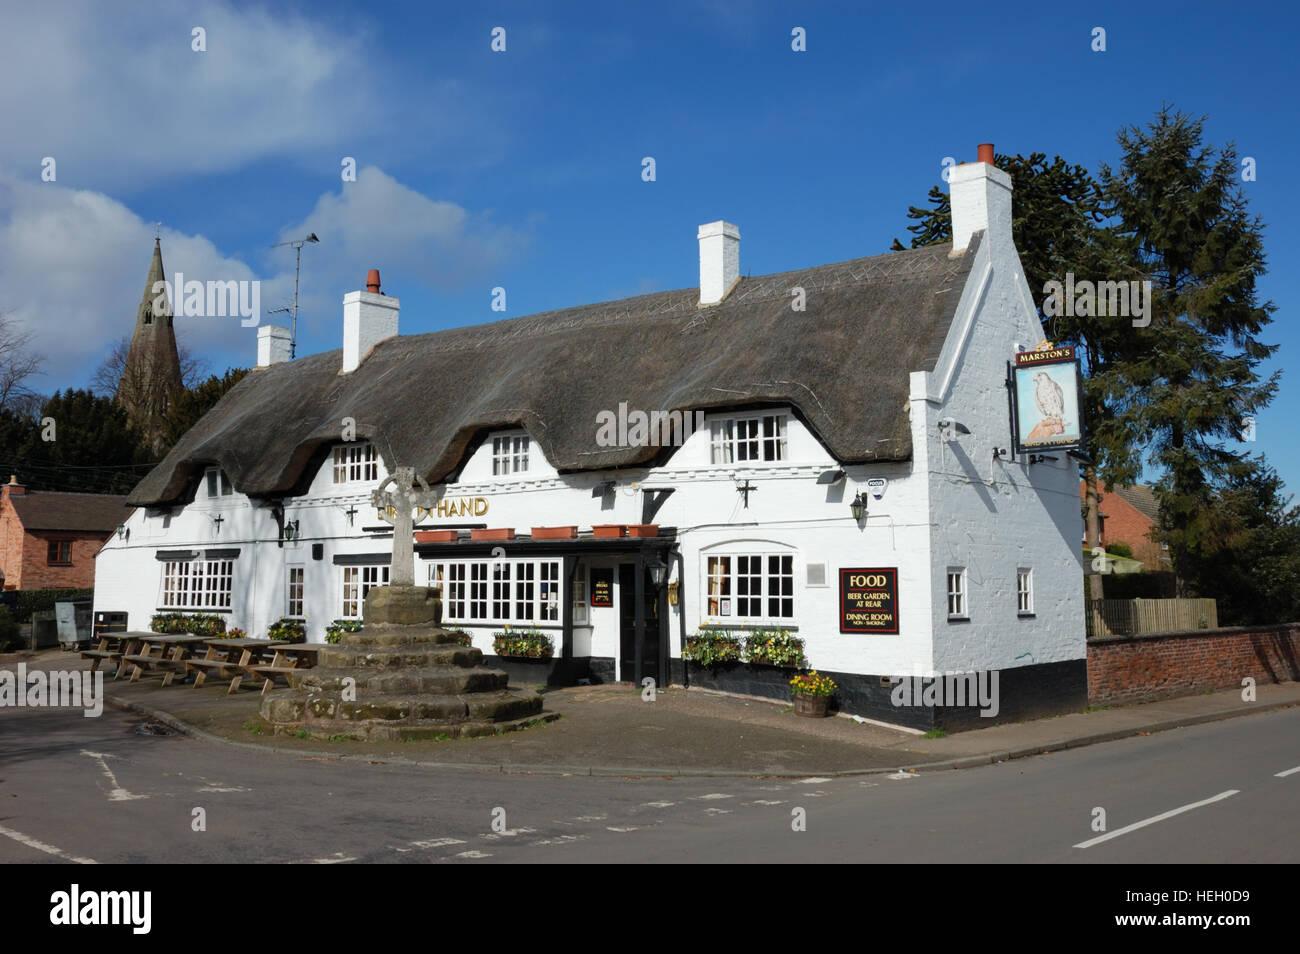 The Bird in Hand a 15th century thatched pub in Austrey, Warwckshire Stock Photo